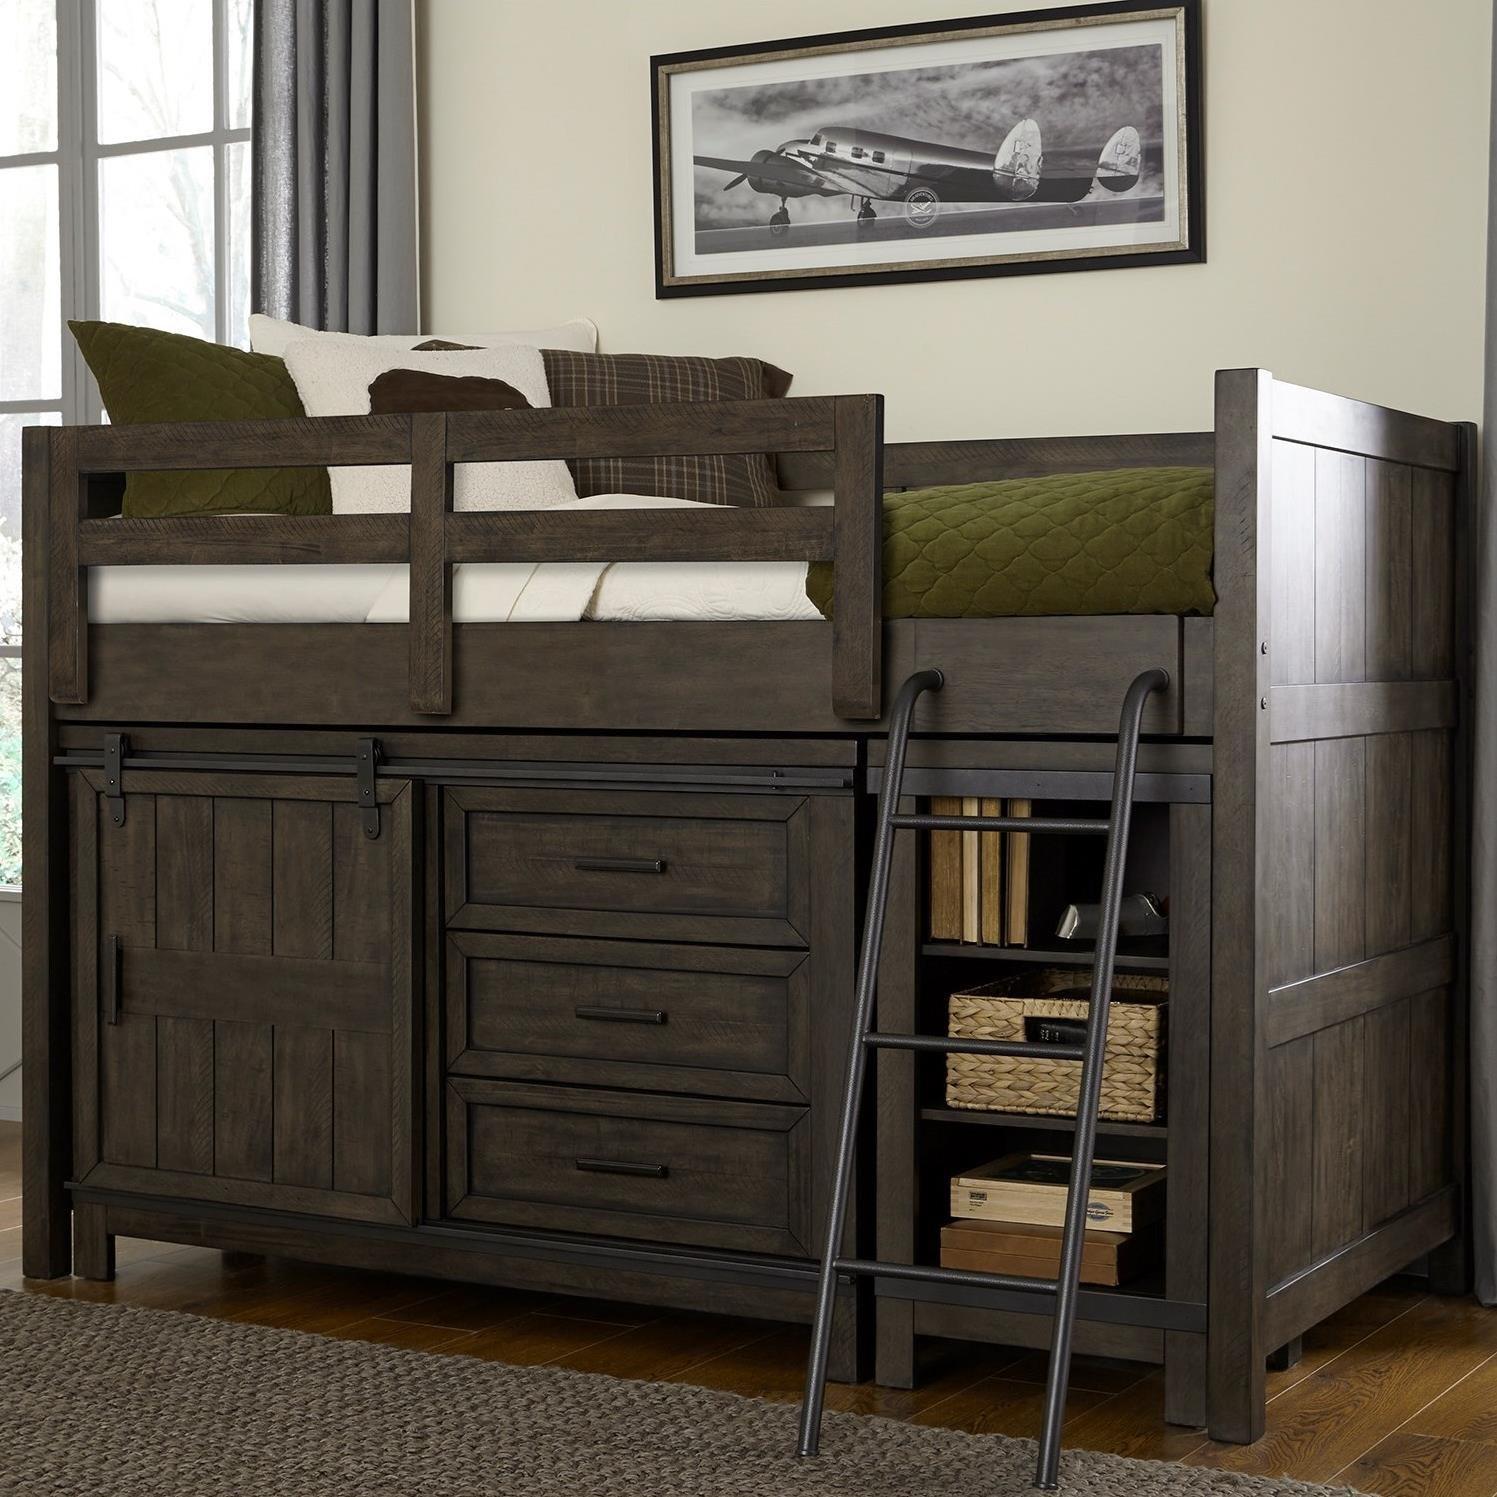 thornwood hills rustic twin loft bed with dresser and low loft bookcase rotmans loft beds. Black Bedroom Furniture Sets. Home Design Ideas